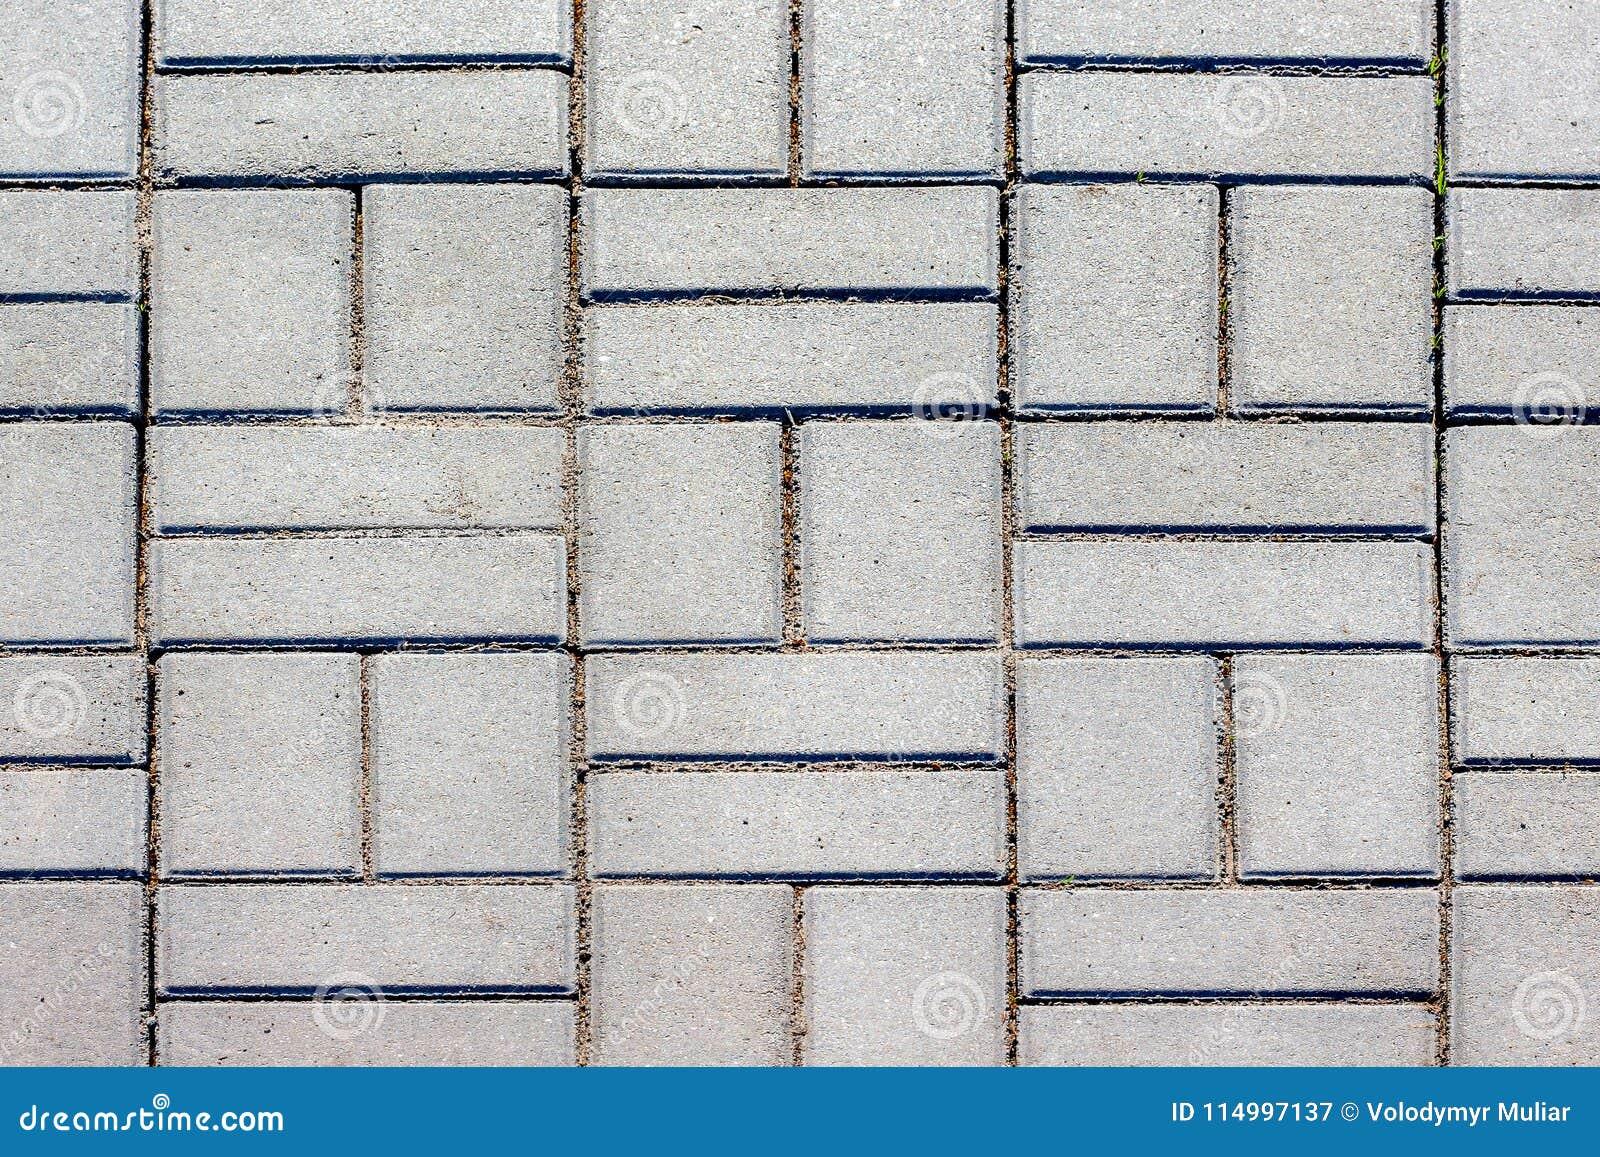 Arrangement of paving slabs 86